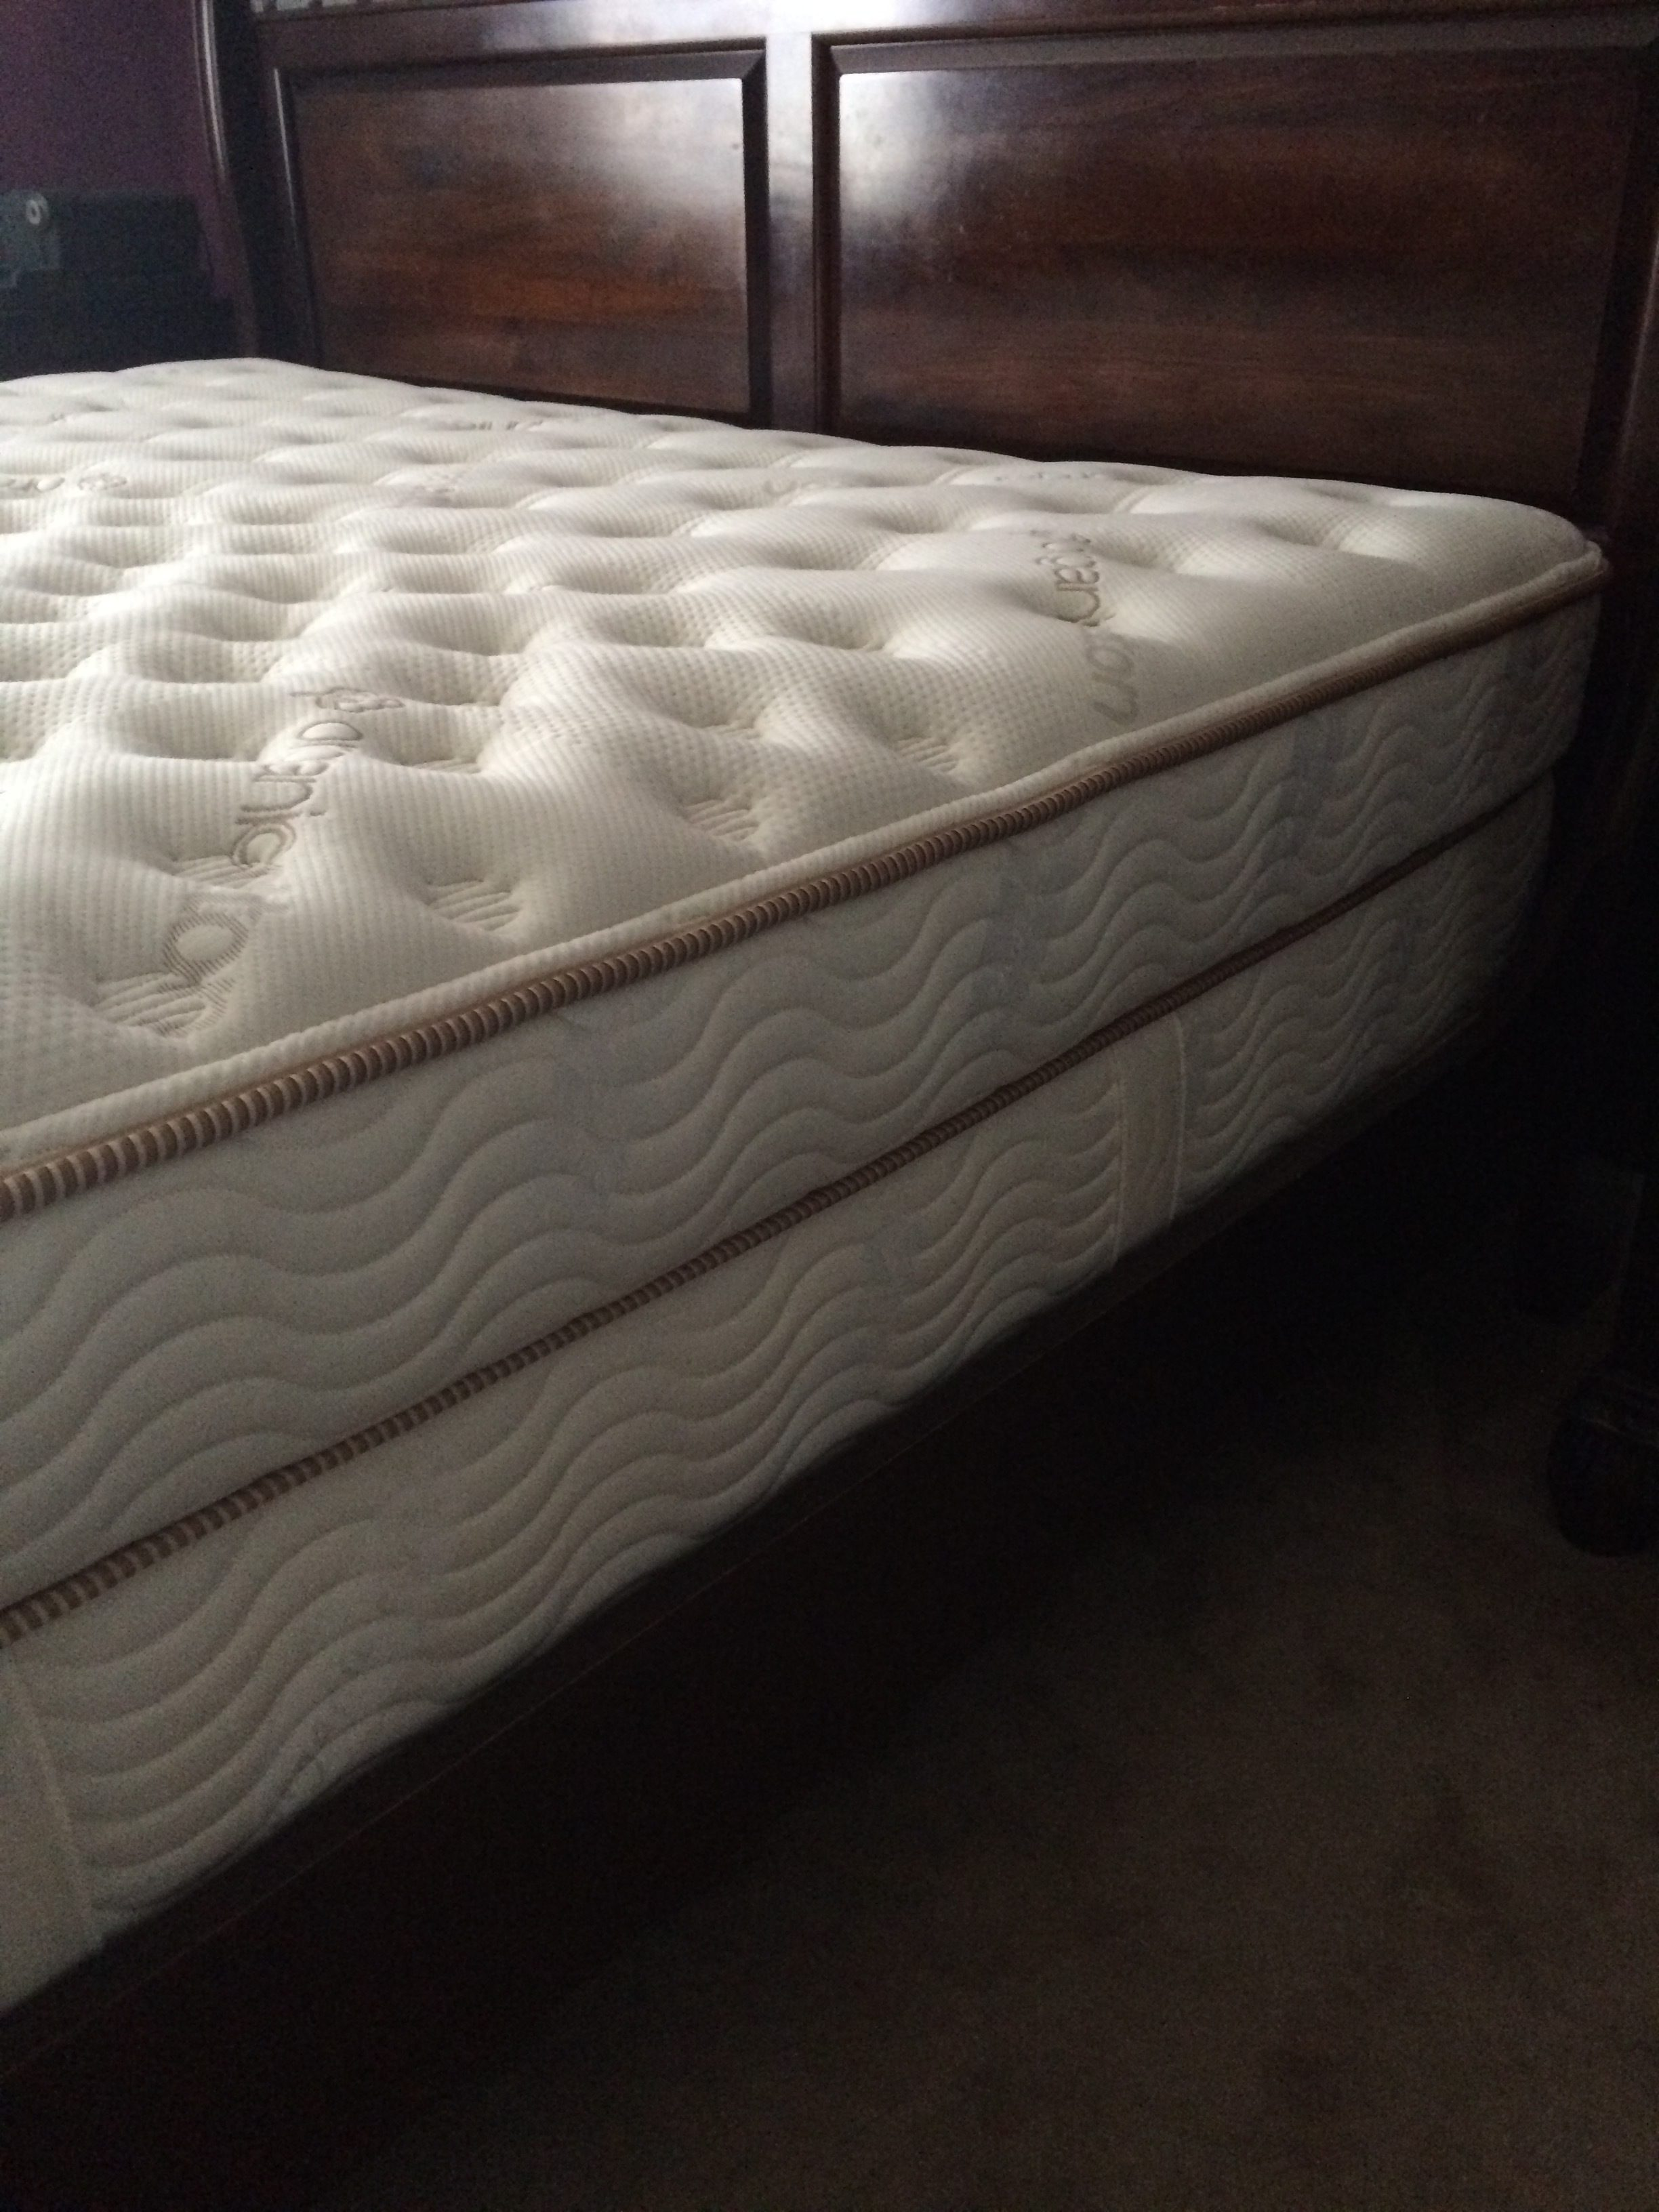 beautiful view both images with reviews of saatva mattresses - Saatva Mattress